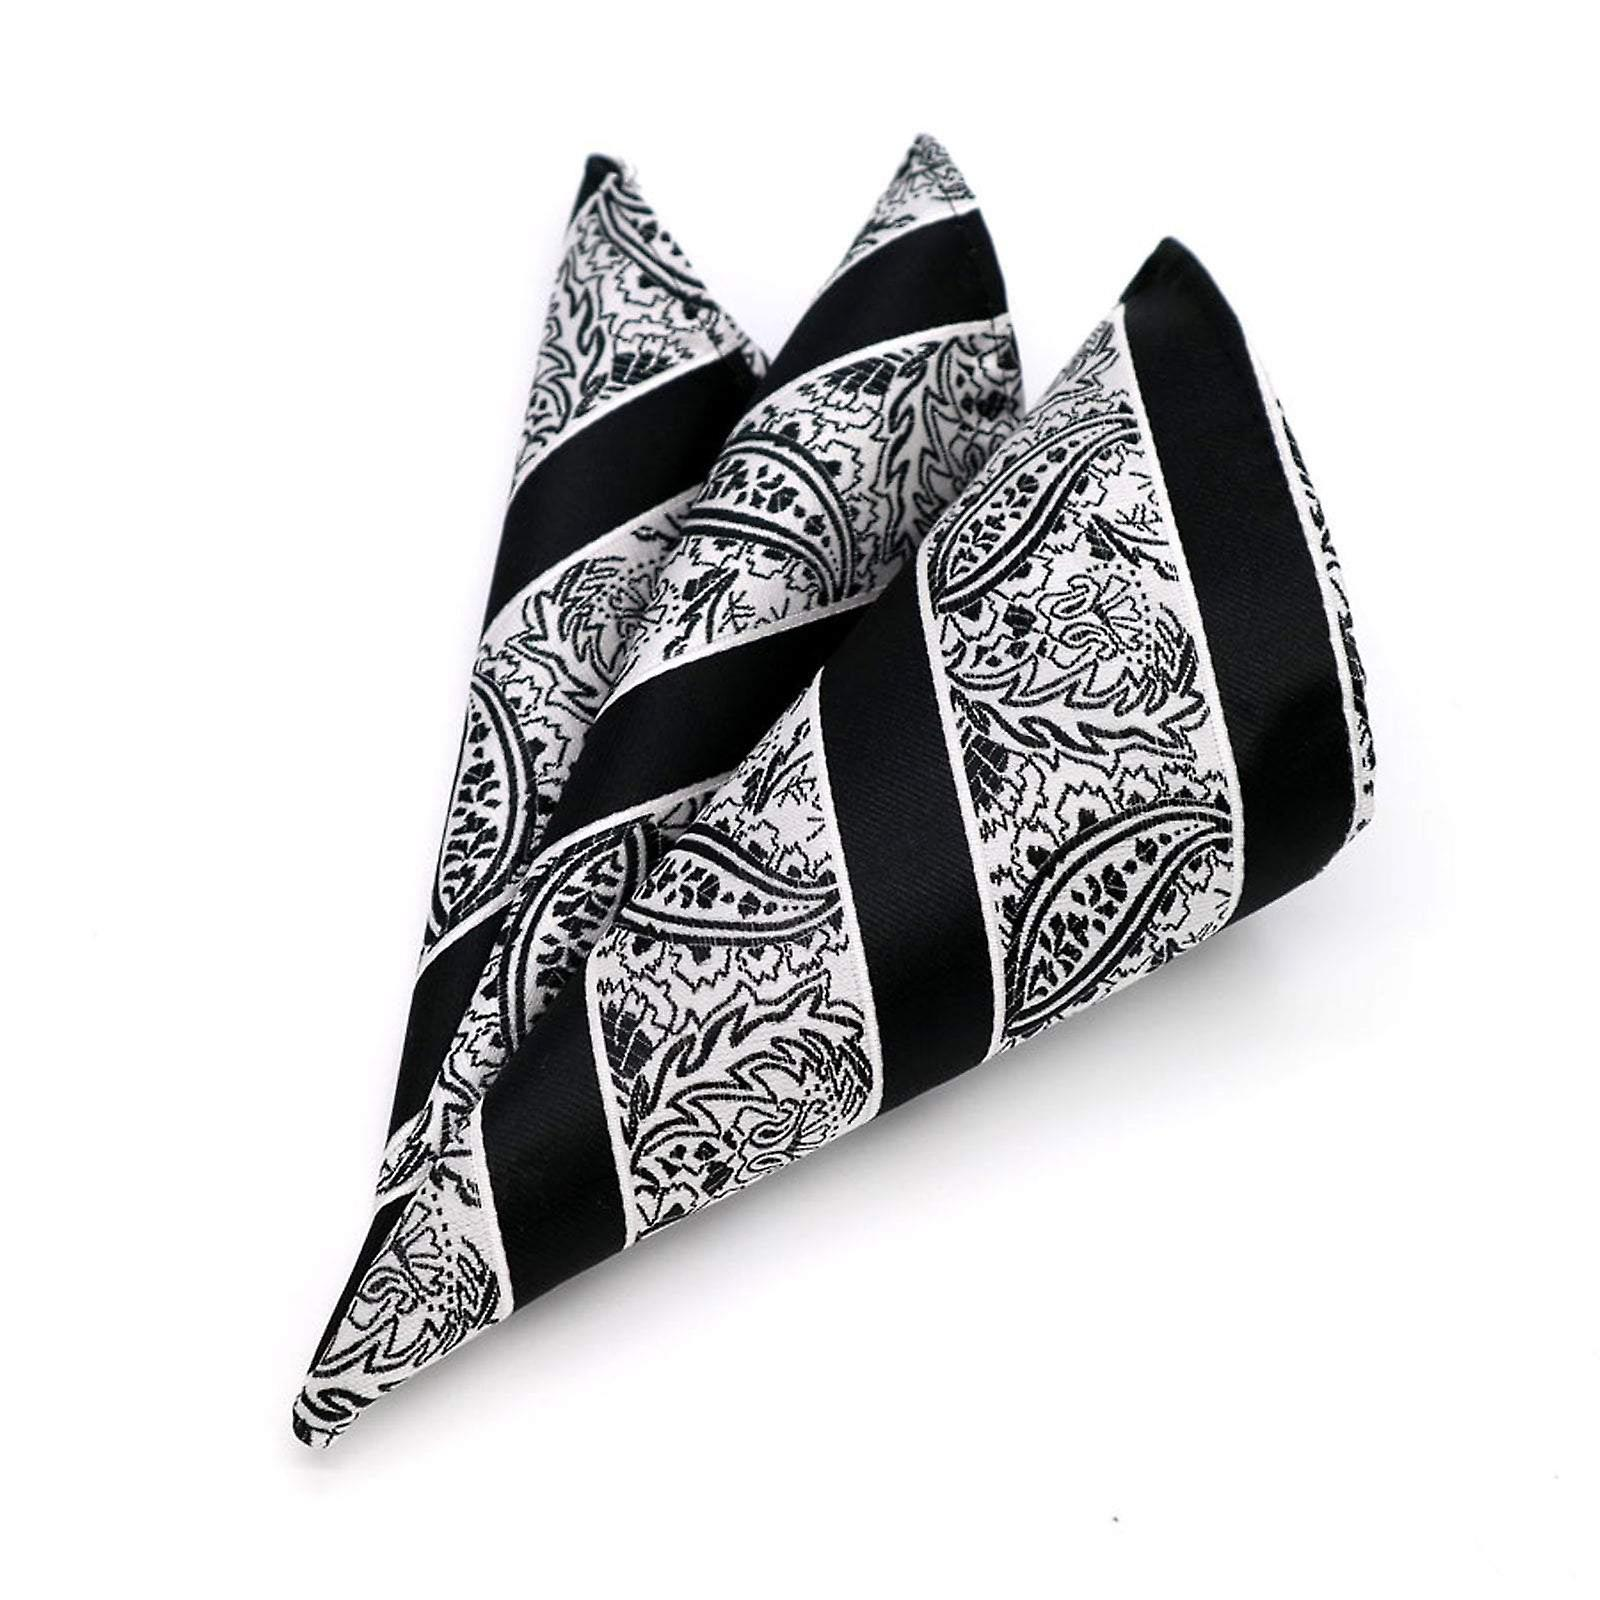 Black & white stripe paisley patterned pocket square